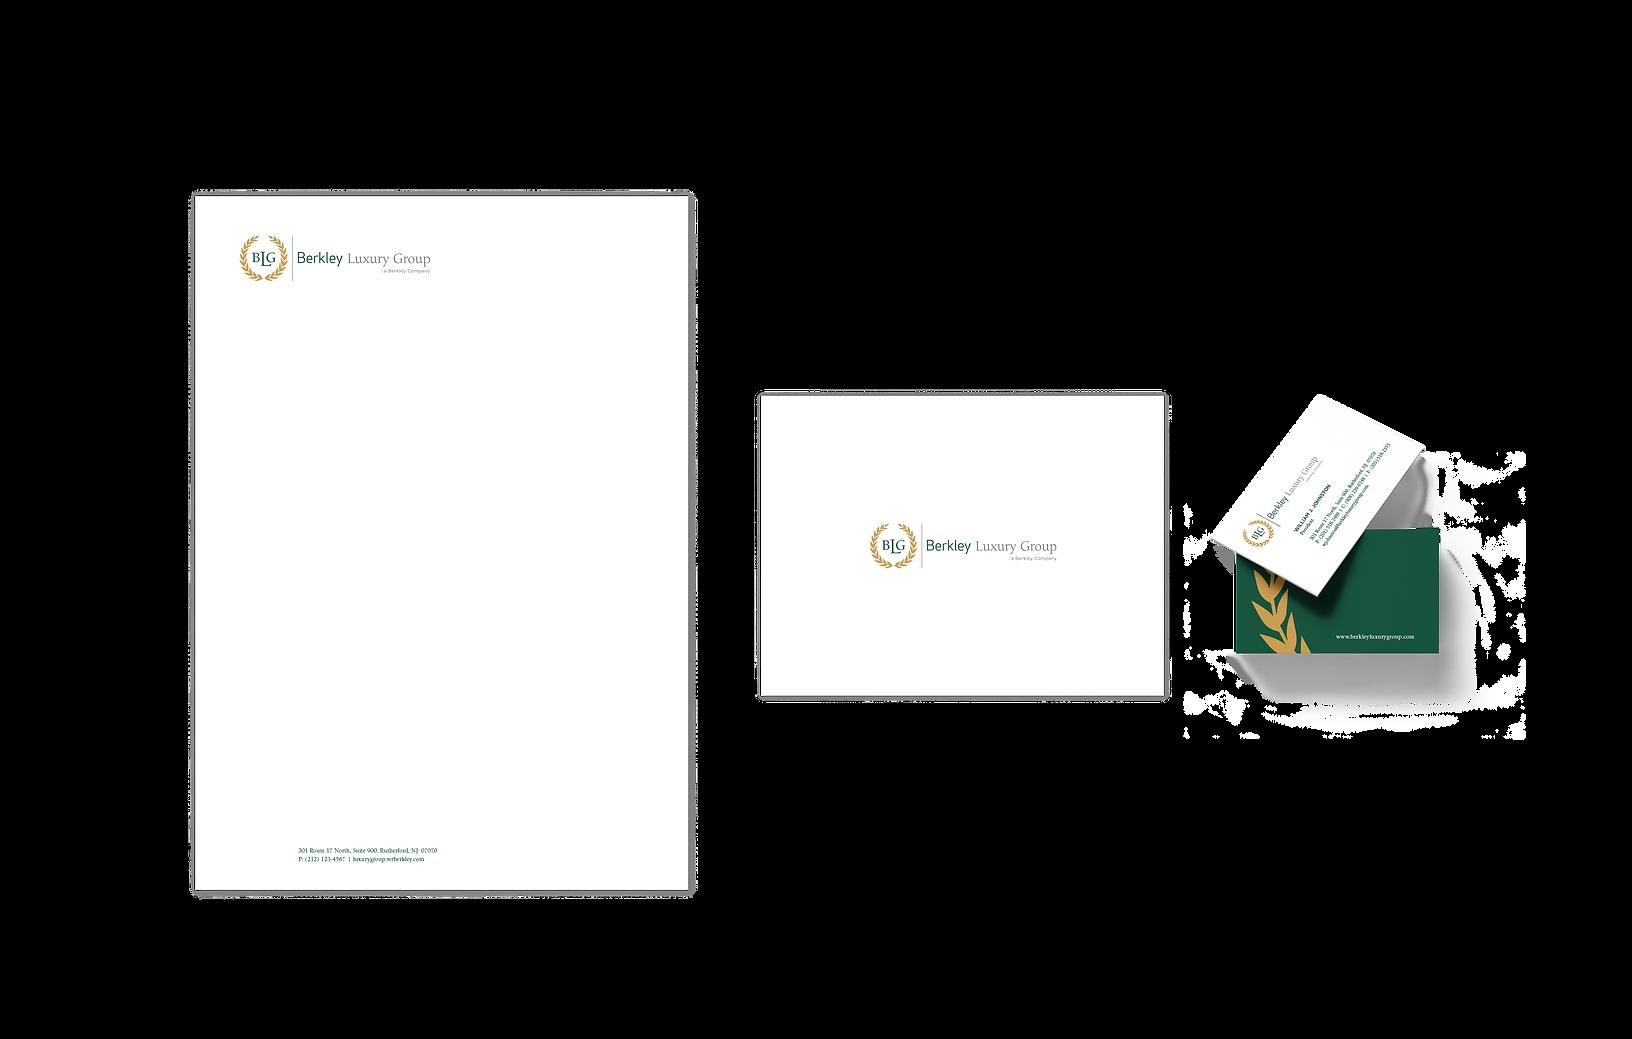 Berkley Luxury Group-Brand Id-letterhead